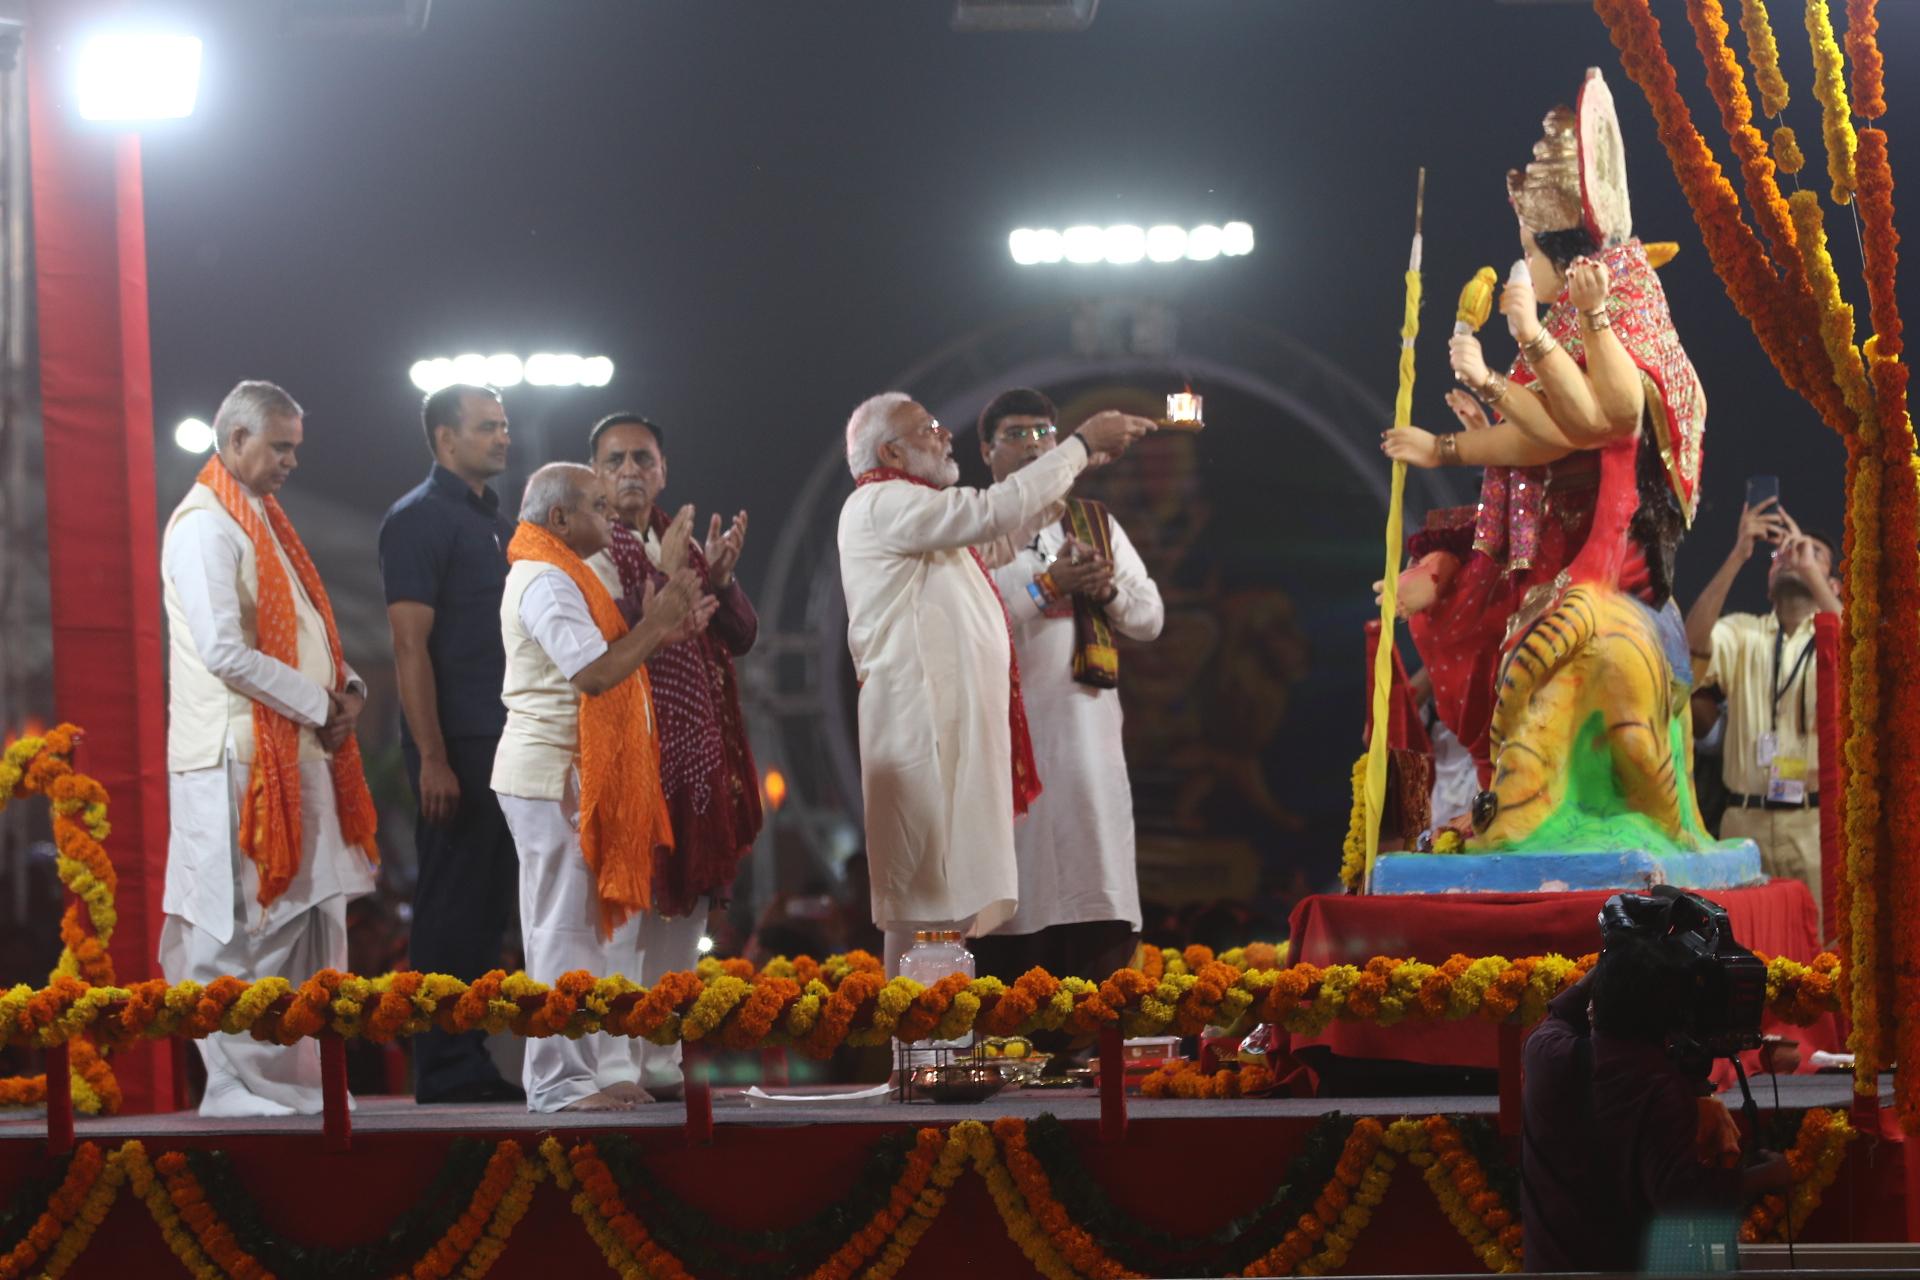 PM Narendra Modi Attended Navratri Festival In Ahmedabad - PM Modi ने वाइब्रेंट Navratri में मां दुर्गा की आरती उतारी | Patrika News